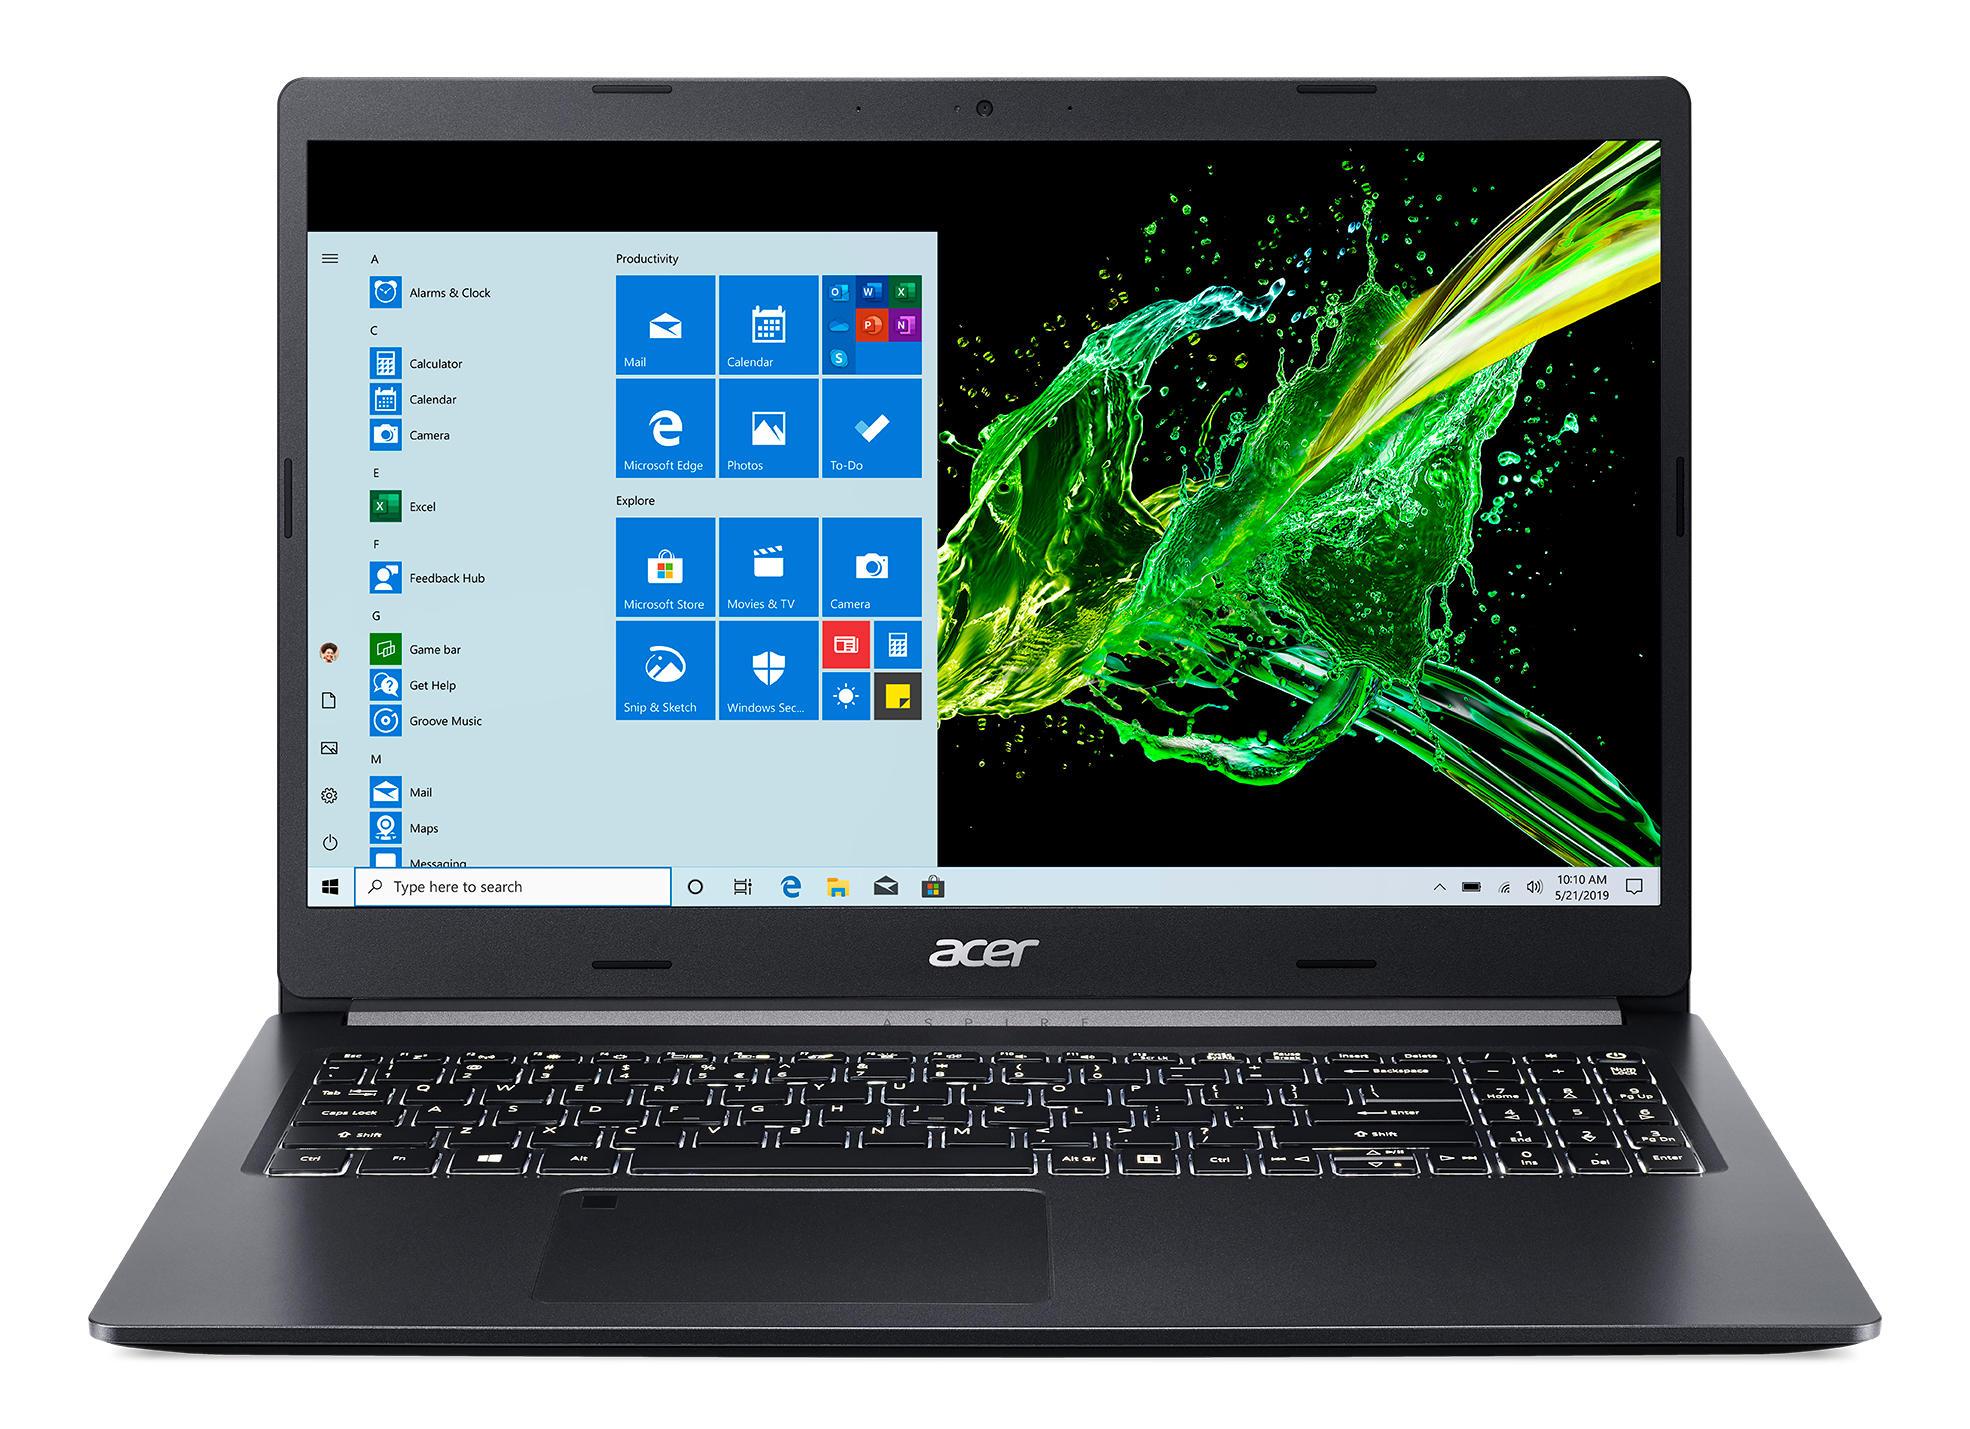 Acer Aspire 5 A515-55G-5083 laptop